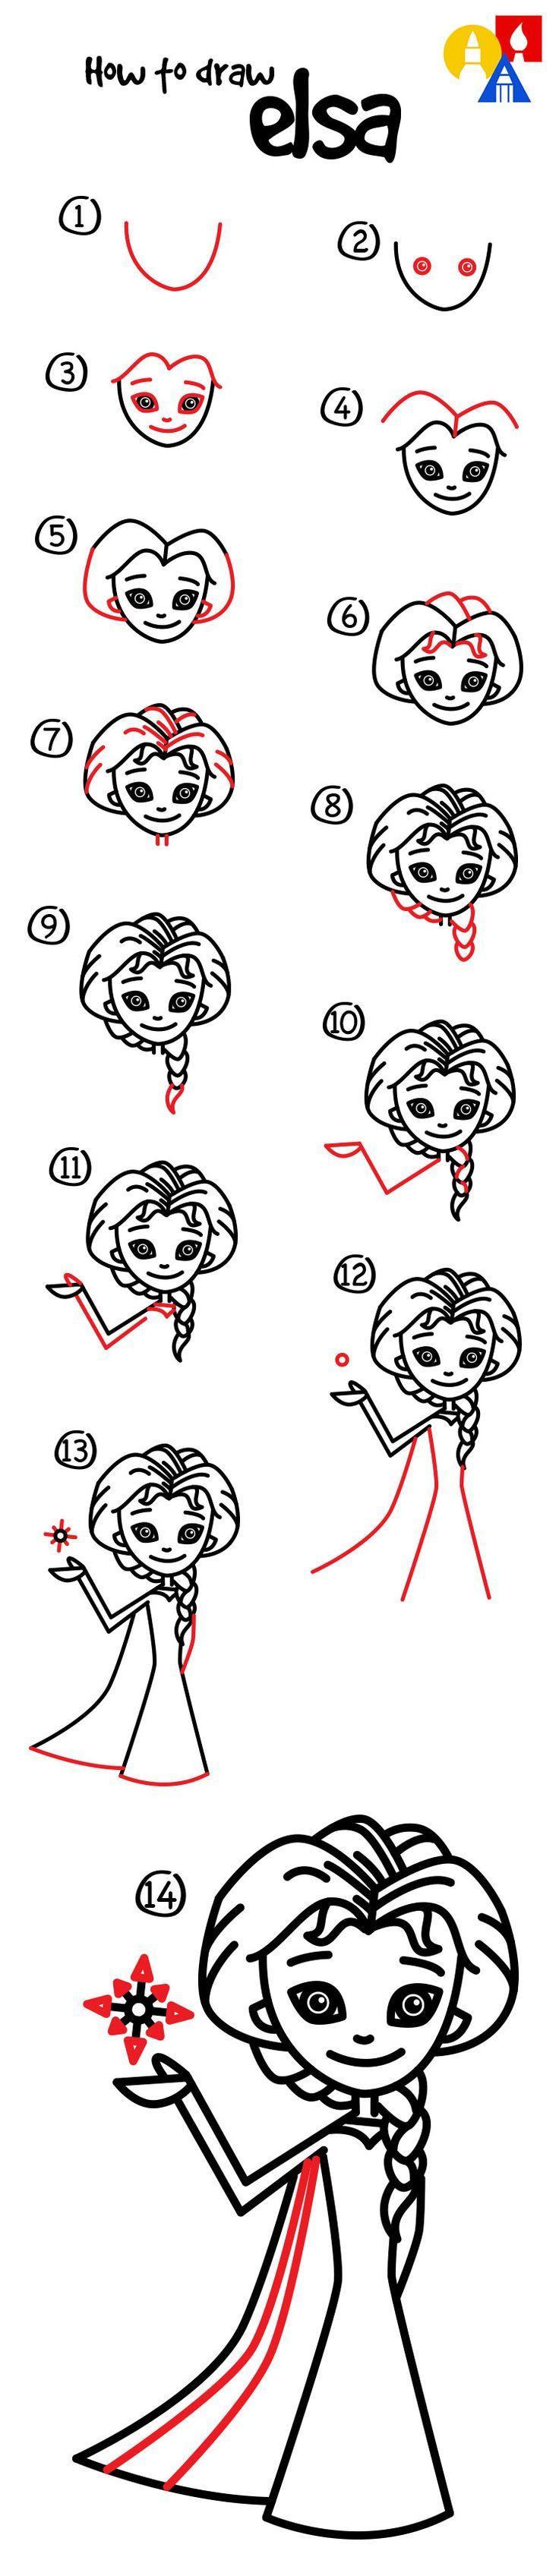 Como Dibujar A Elsa Cizimler Cizim Boyama Sayfalari